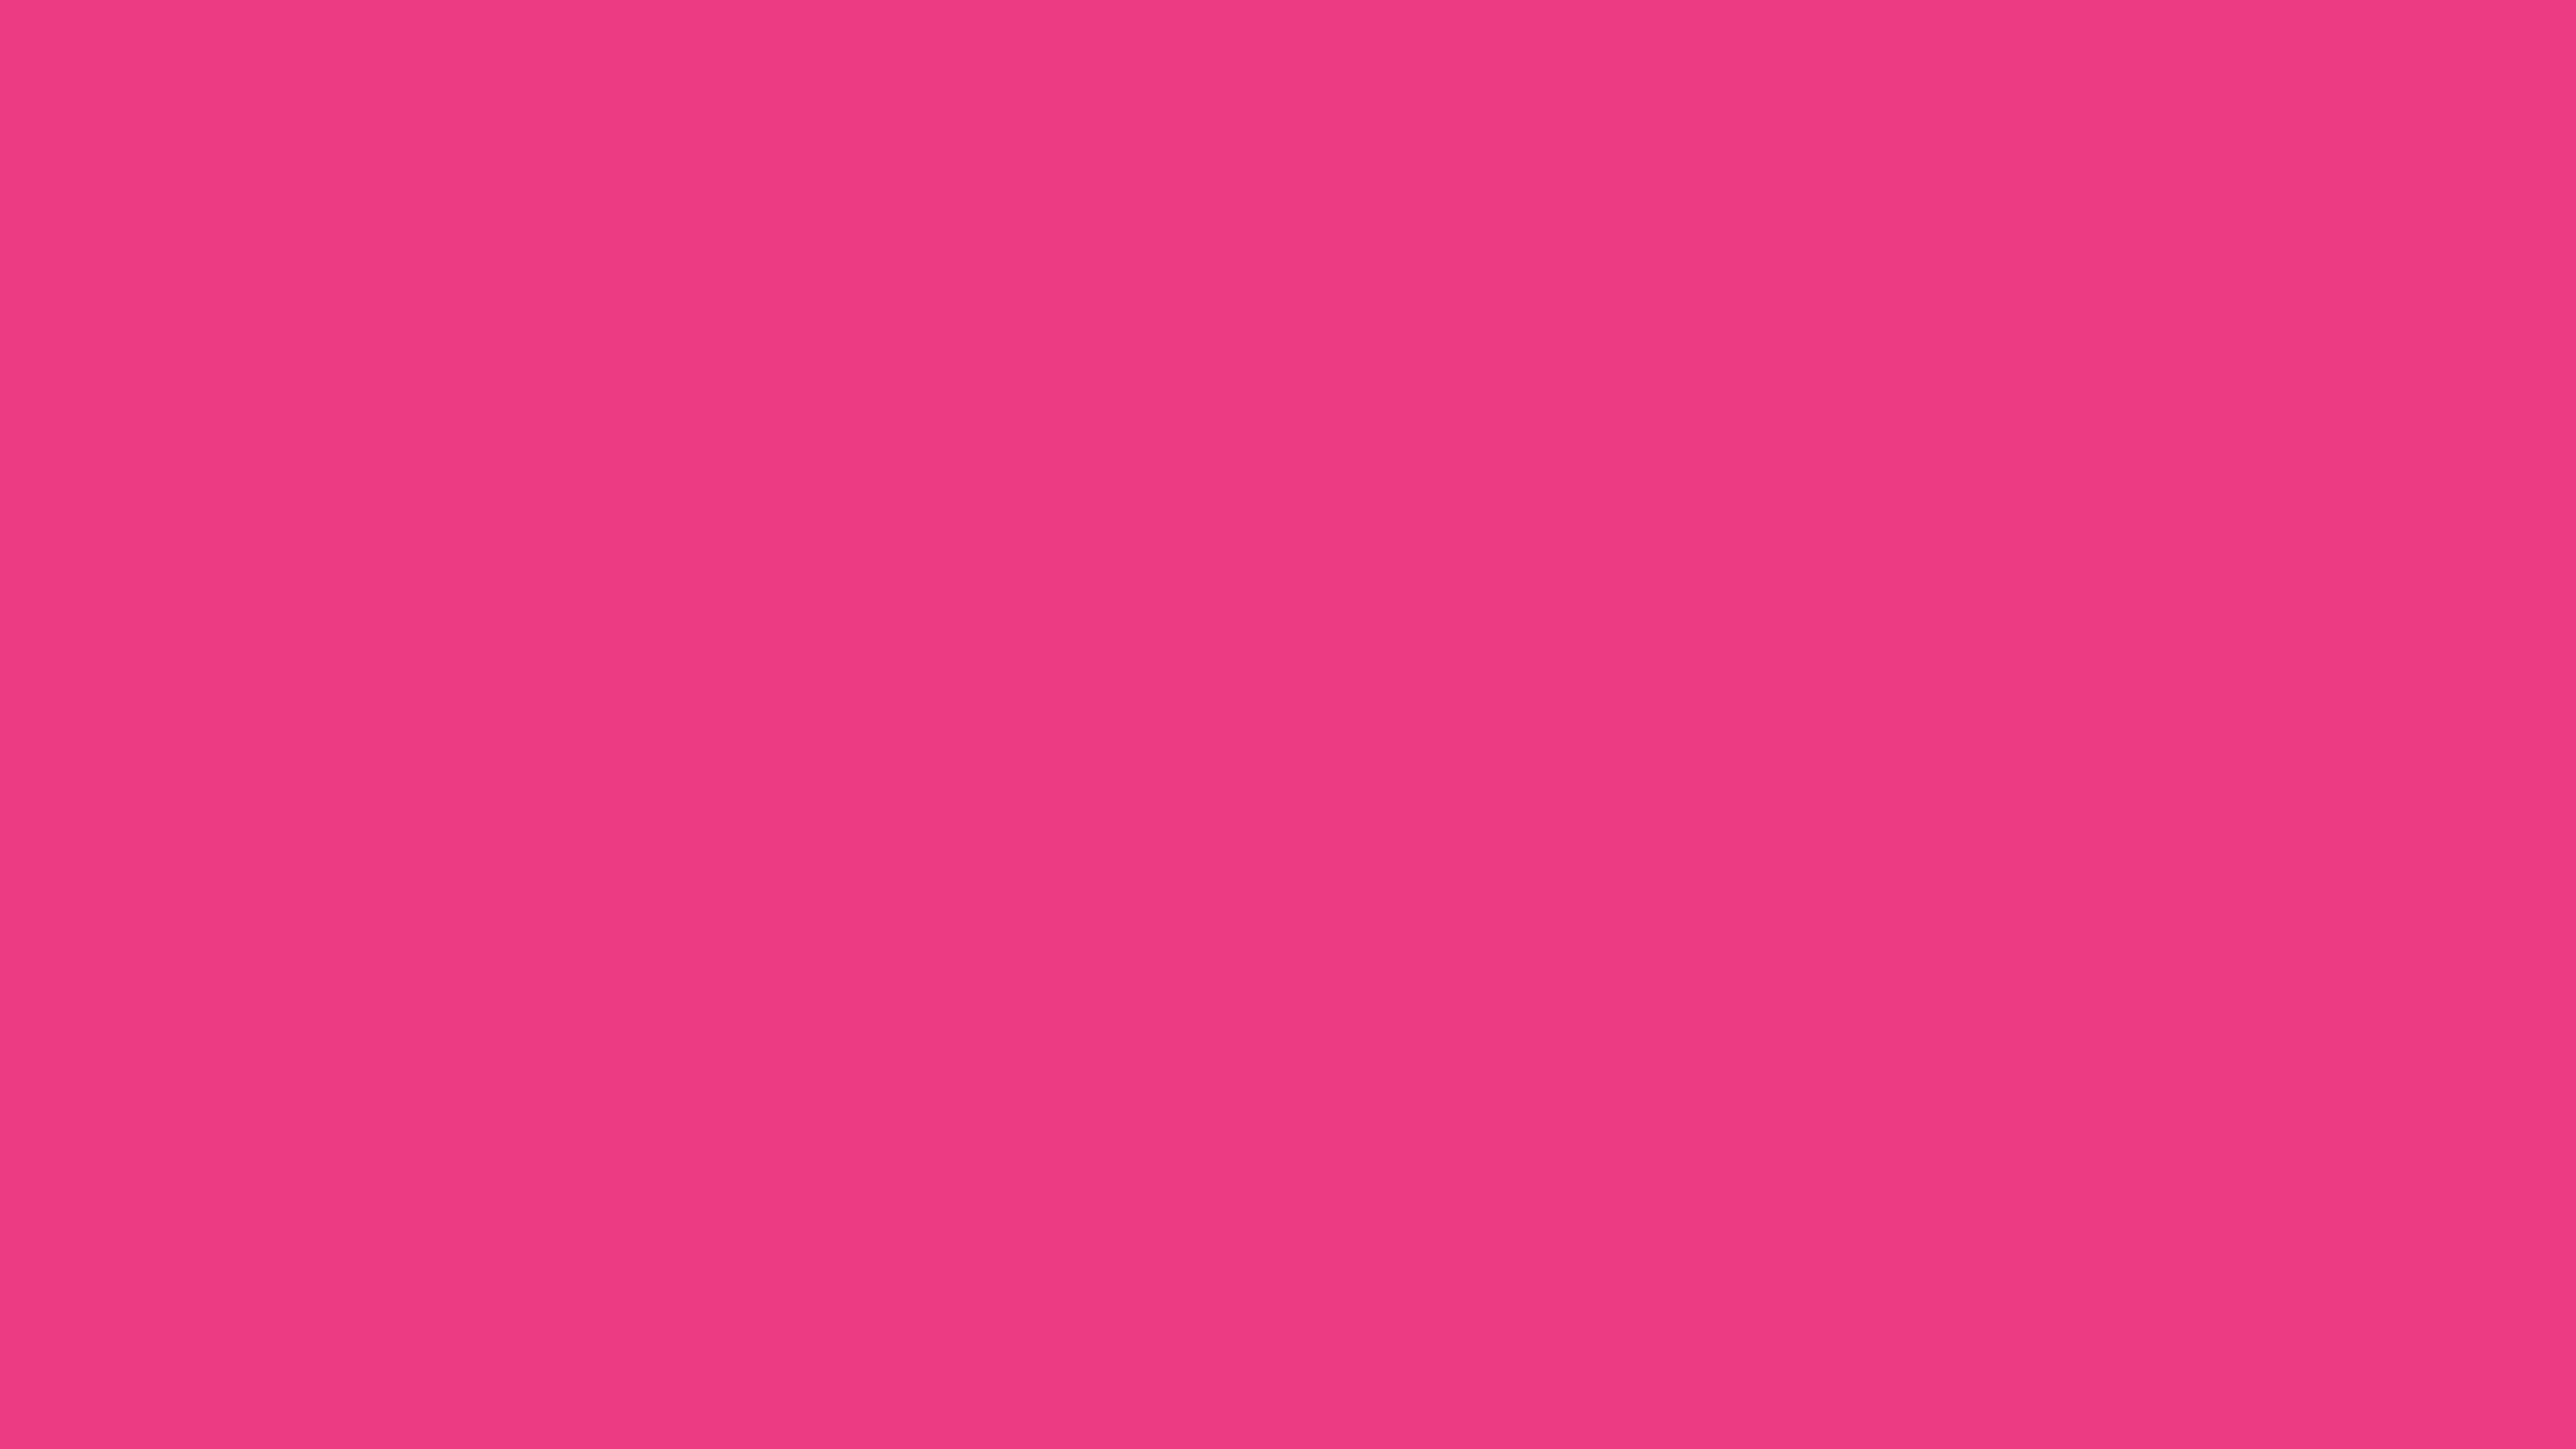 4096x2304 Cerise Pink Solid Color Background